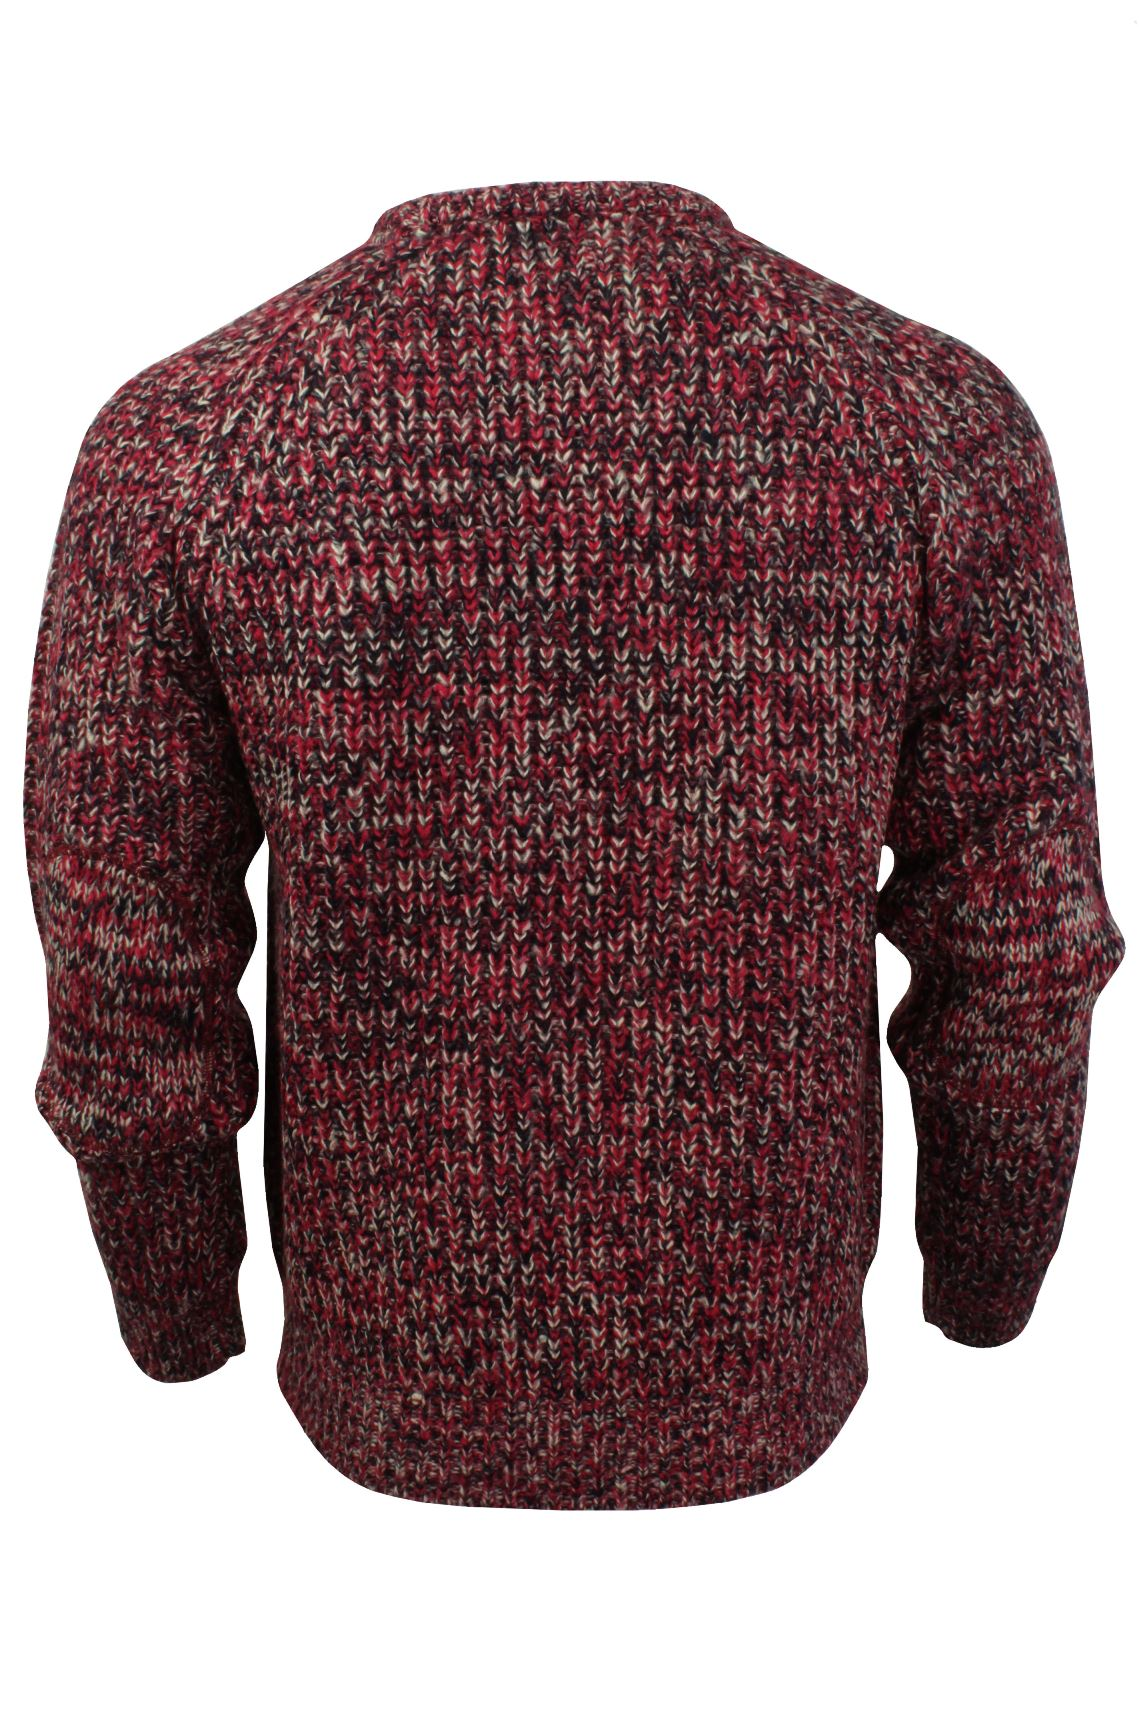 Xact-Mens-Jumper-Fashion-Chunky-Fisherman-Fleck-Knit-Long-Sleeve thumbnail 13